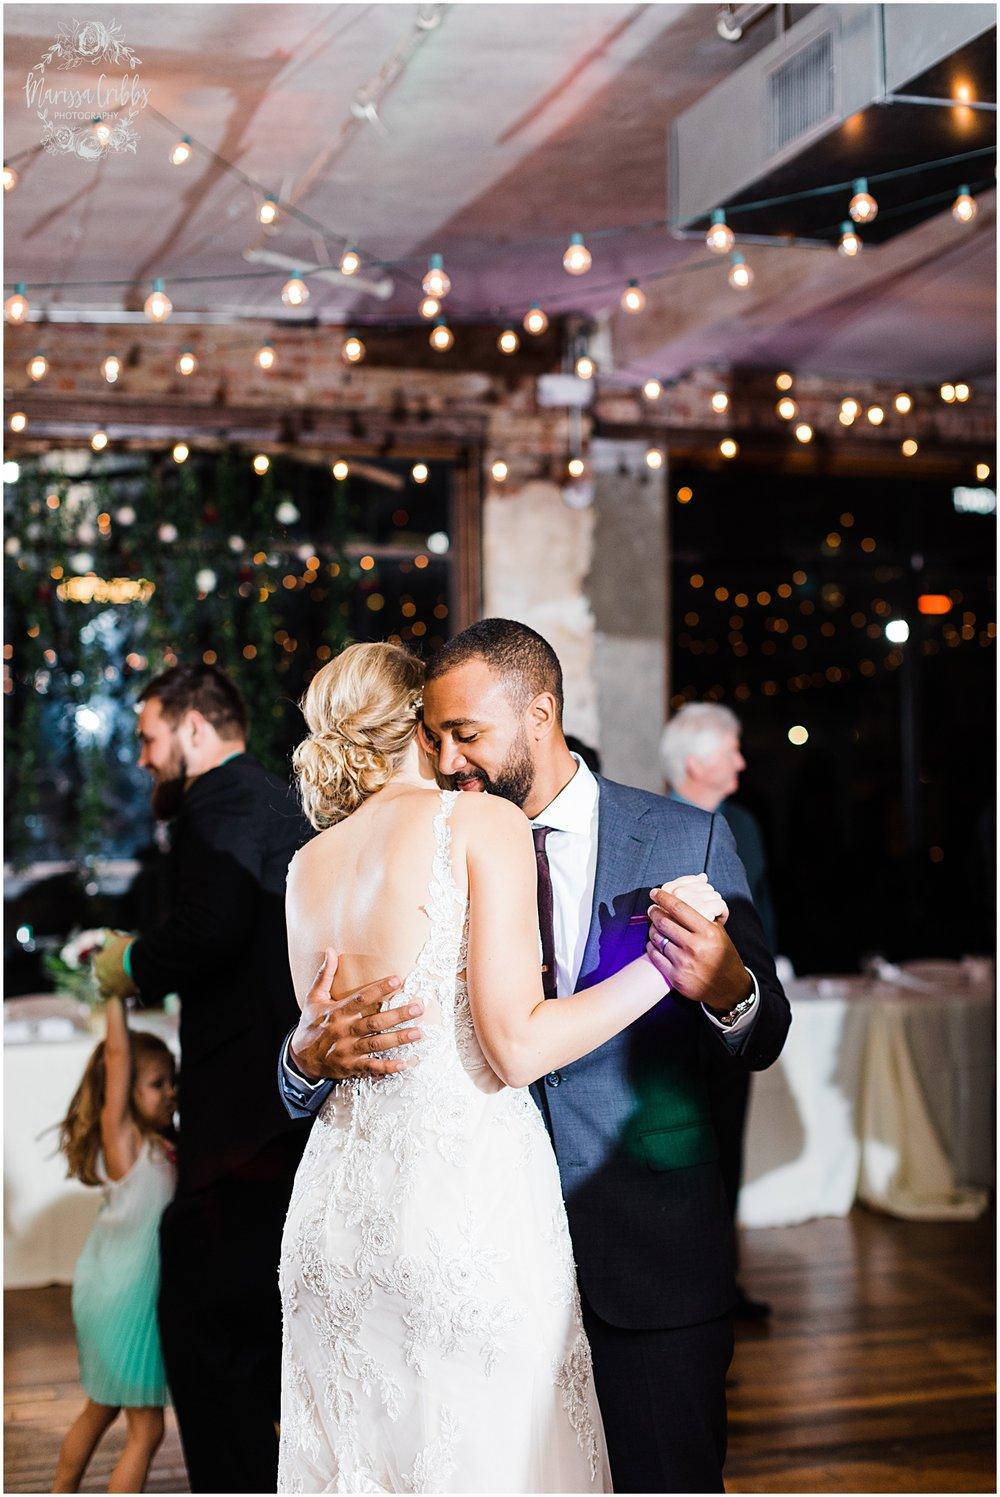 BAUER WEDDING | KELSEA & JUSTIN | MARISSA CRIBBS PHOTOGRAPHY_6609.jpg